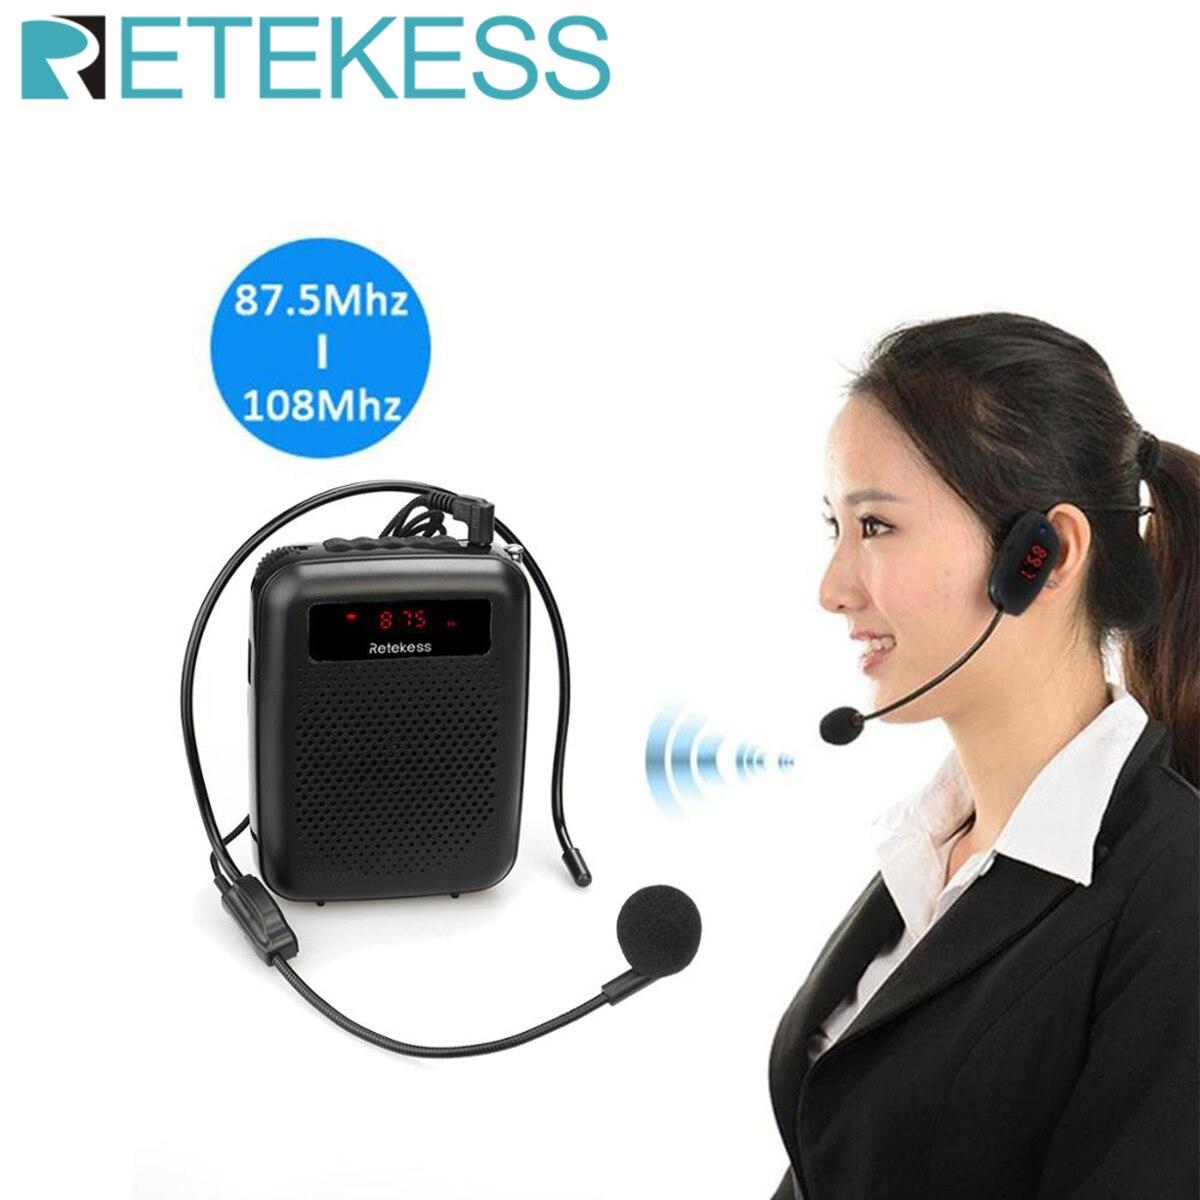 RETEKESS PR16R مكبر الصوت المحمولة مضخم صوت المعلم ميكروفون المتكلم 12 واط FM تسجيل مع مشغل Mp3 راديو FM مسجل